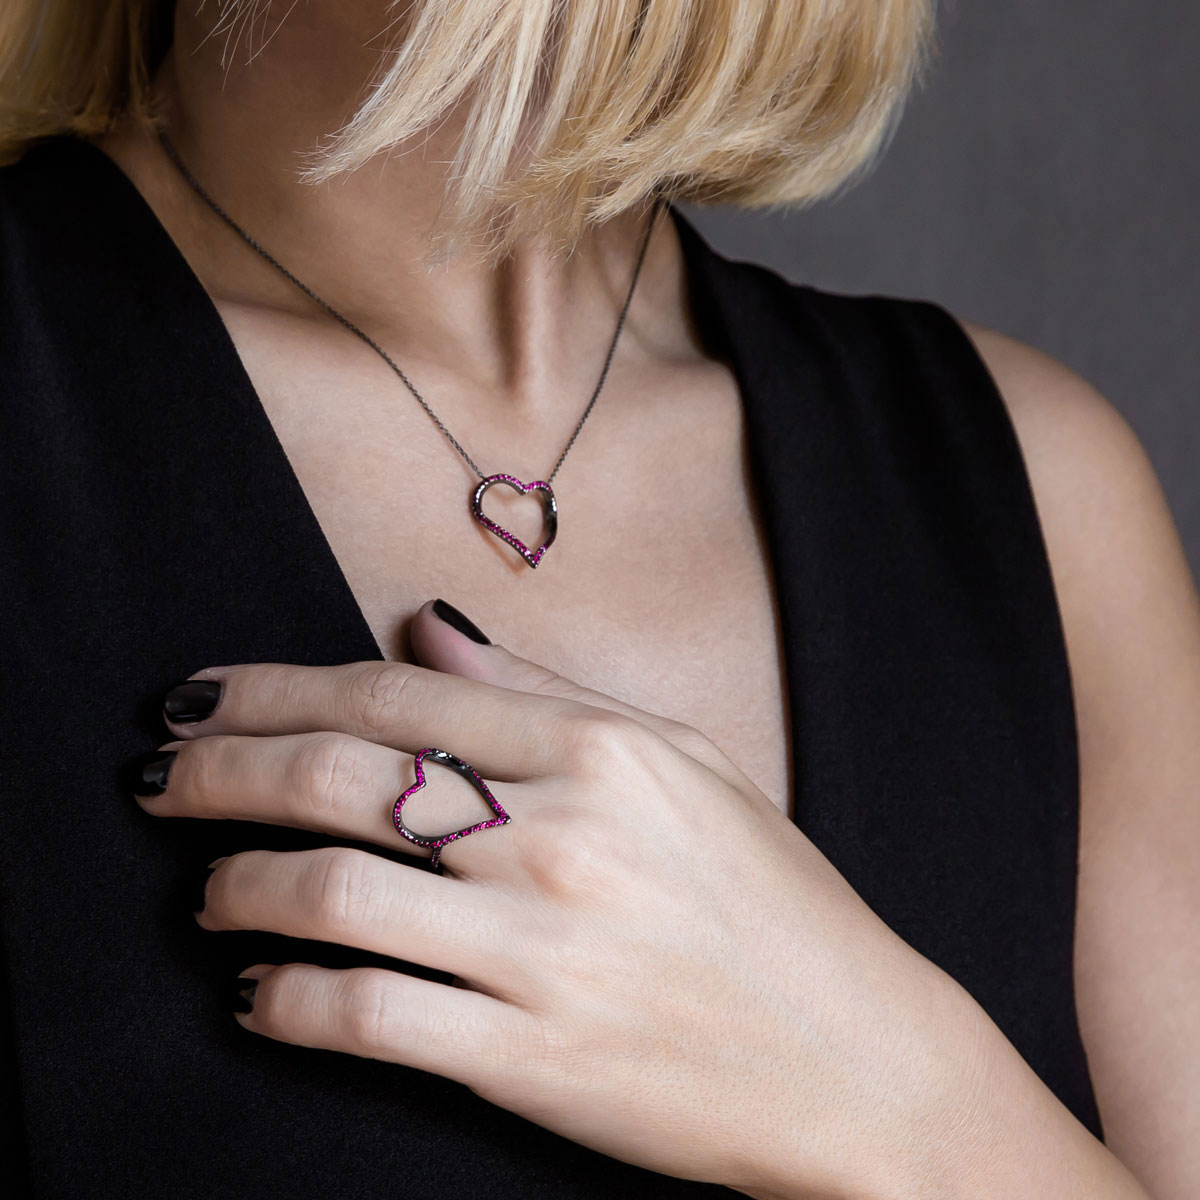 انگشتر طلا Black heart ۲